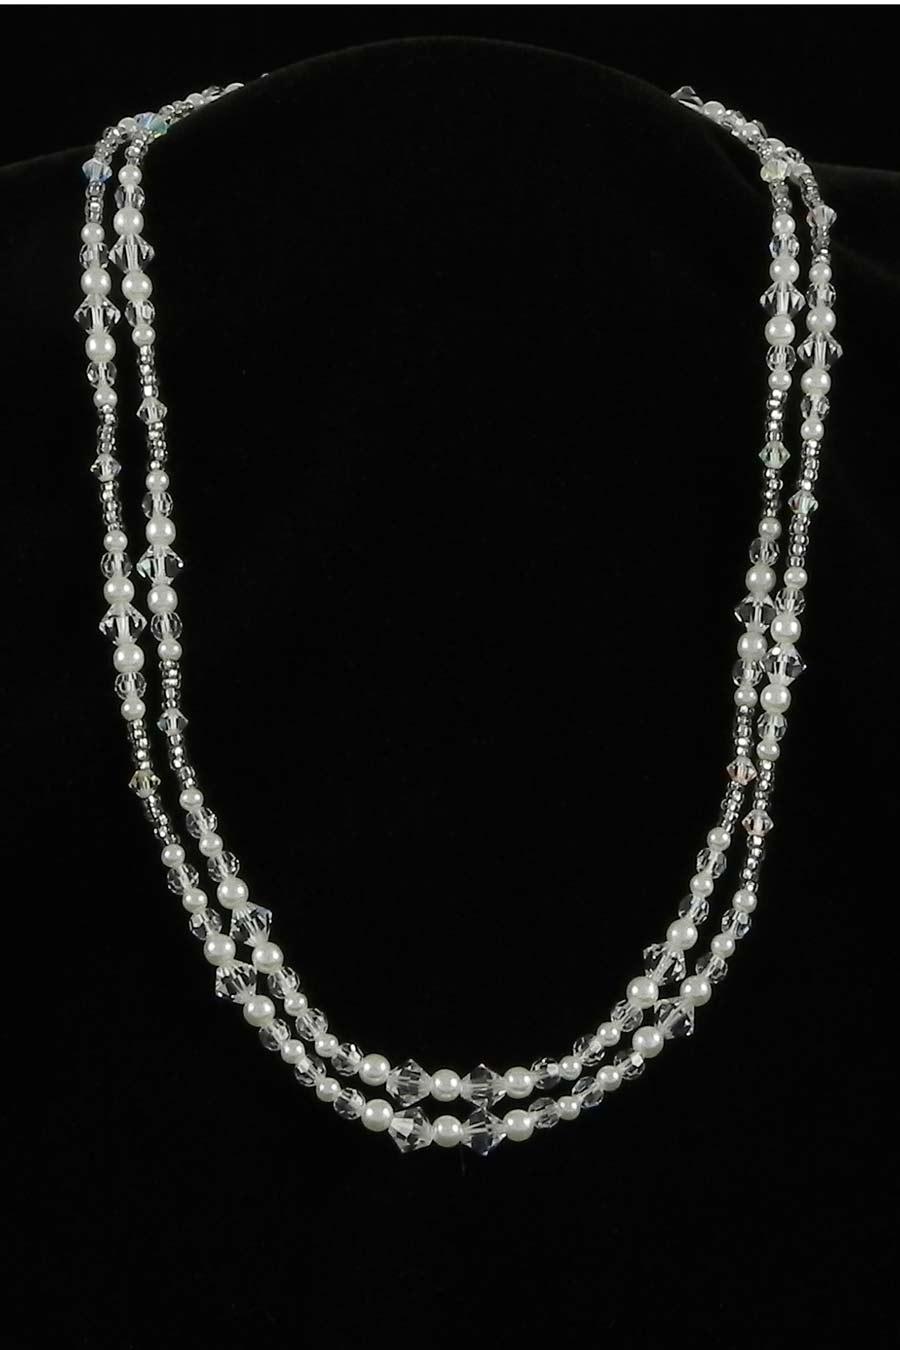 Toni Federici 2 Strand Silver & Pearl Necklace Bridal Jewelry